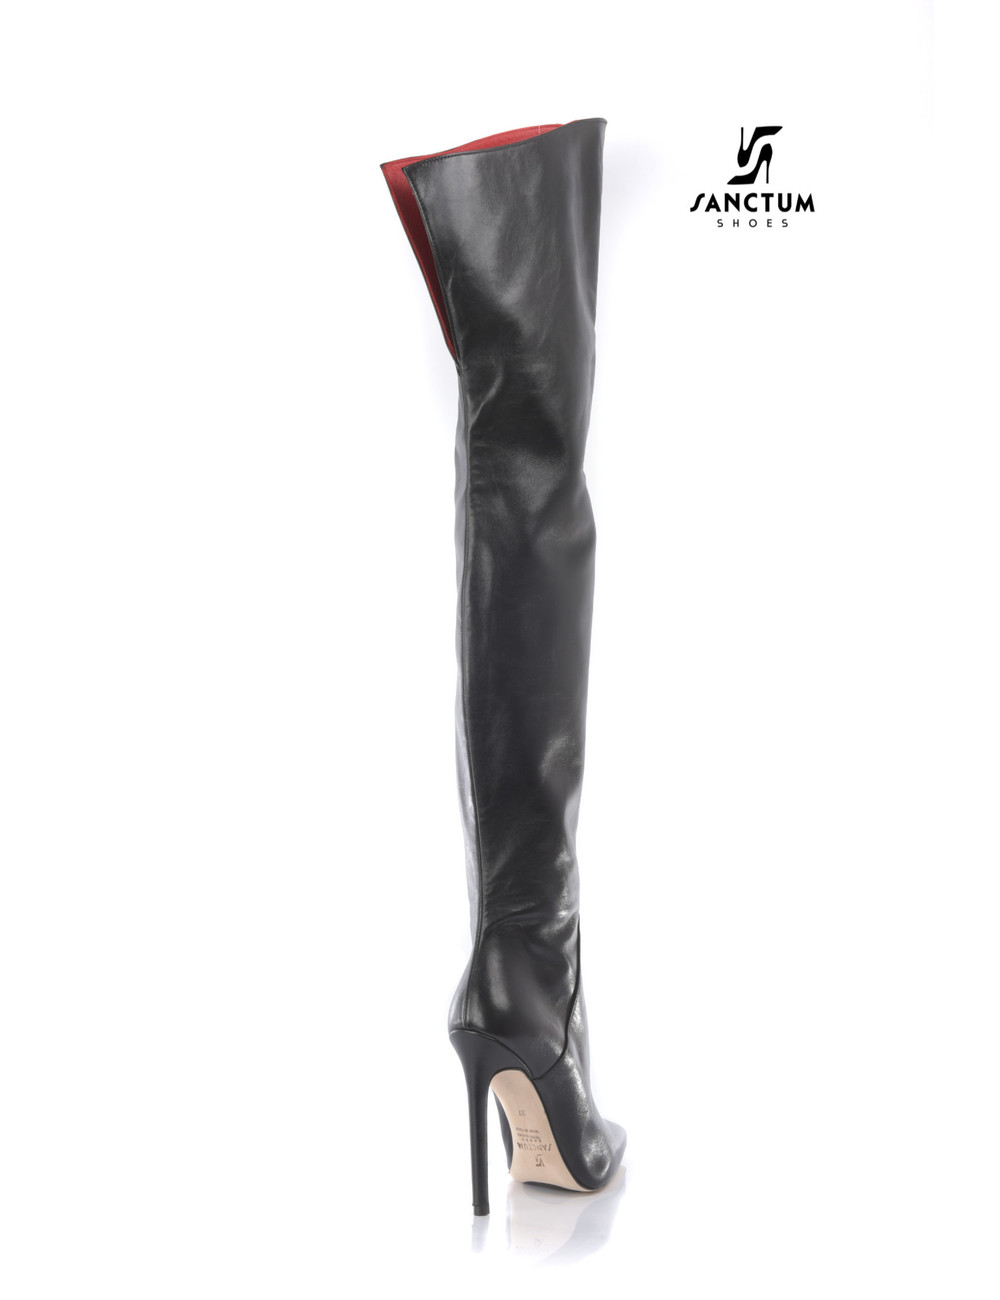 Sanctum  CUSTOM High Italian THIGH boots VESTA with stiletto heels in genuine leather